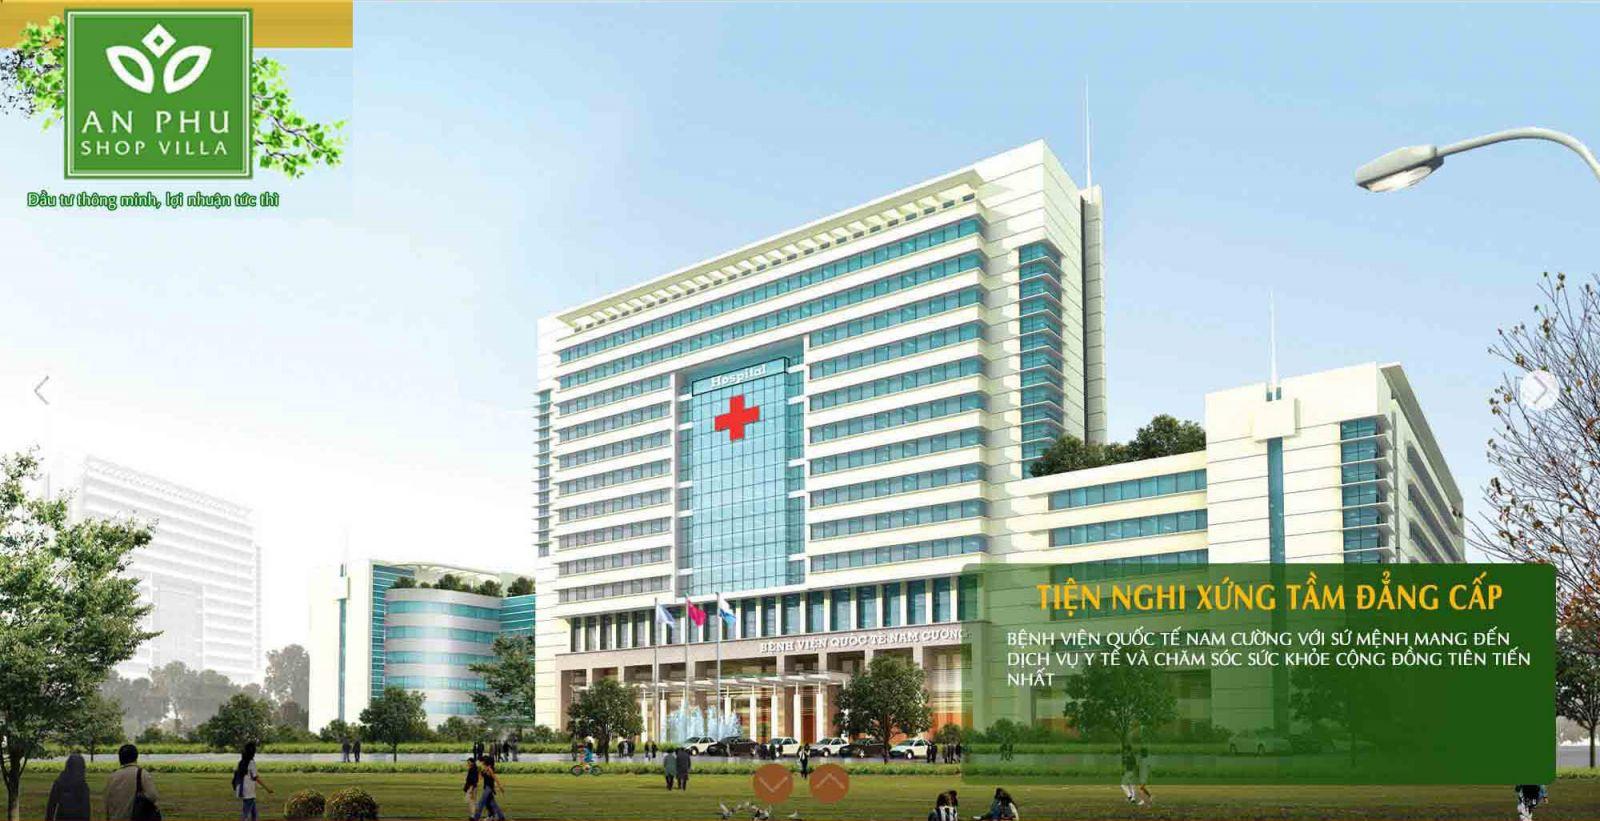 Bệnh viện quốc tế tại An Phú Shop Villa